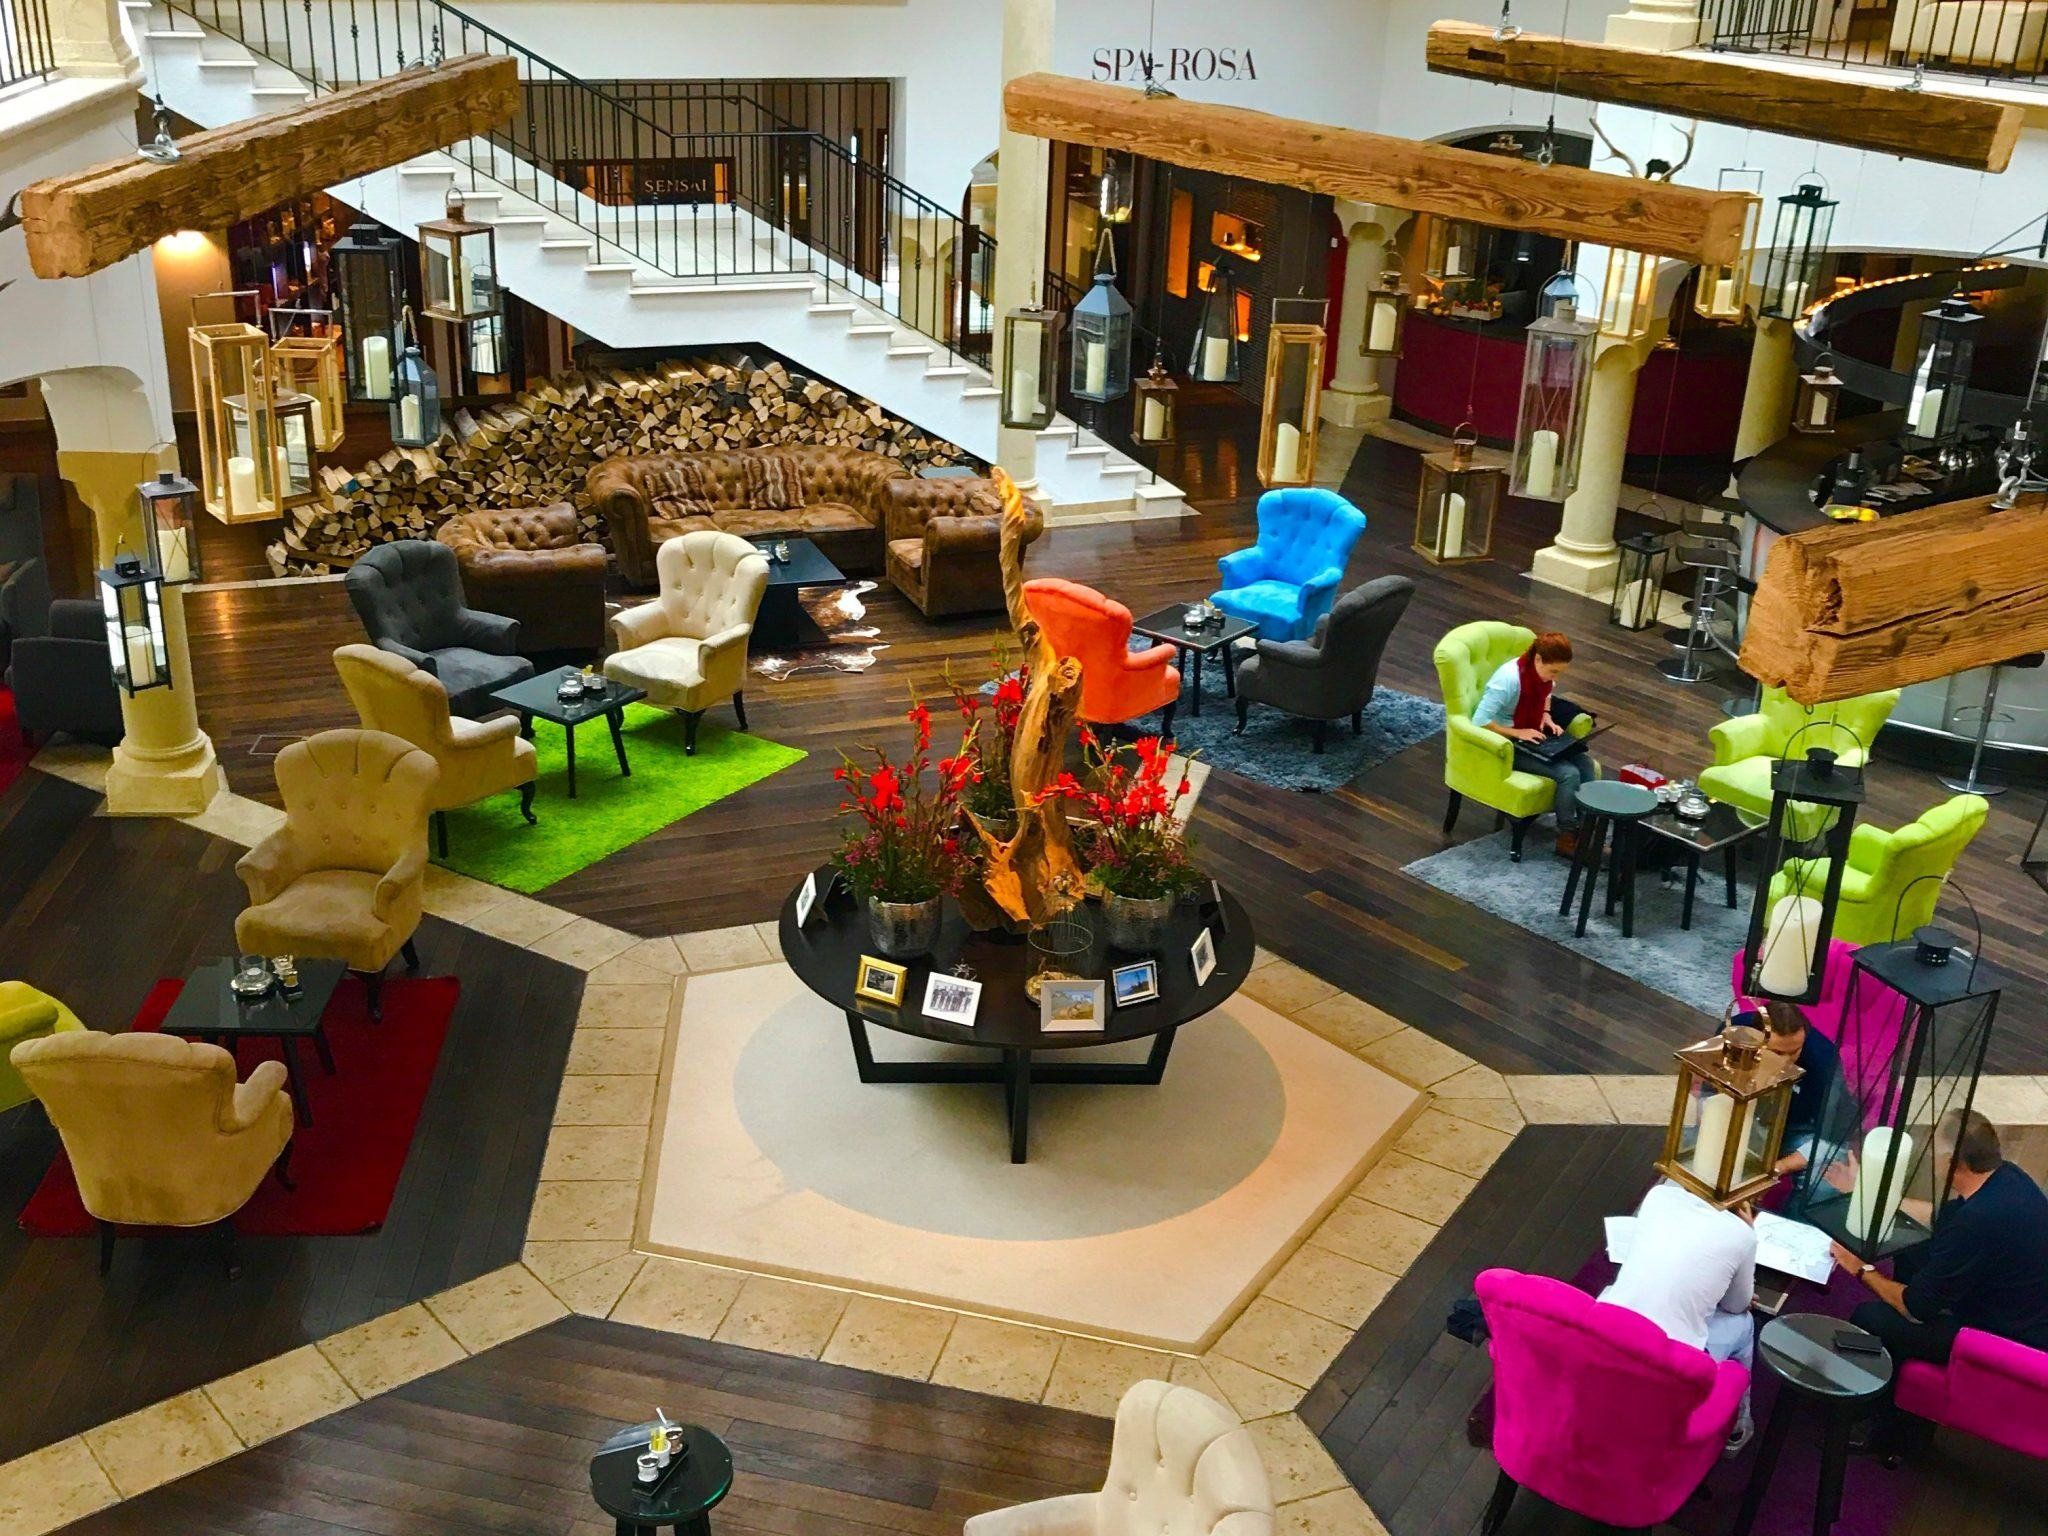 Hotel Arosa Kitzbühel Austria Boutique Hotel Review